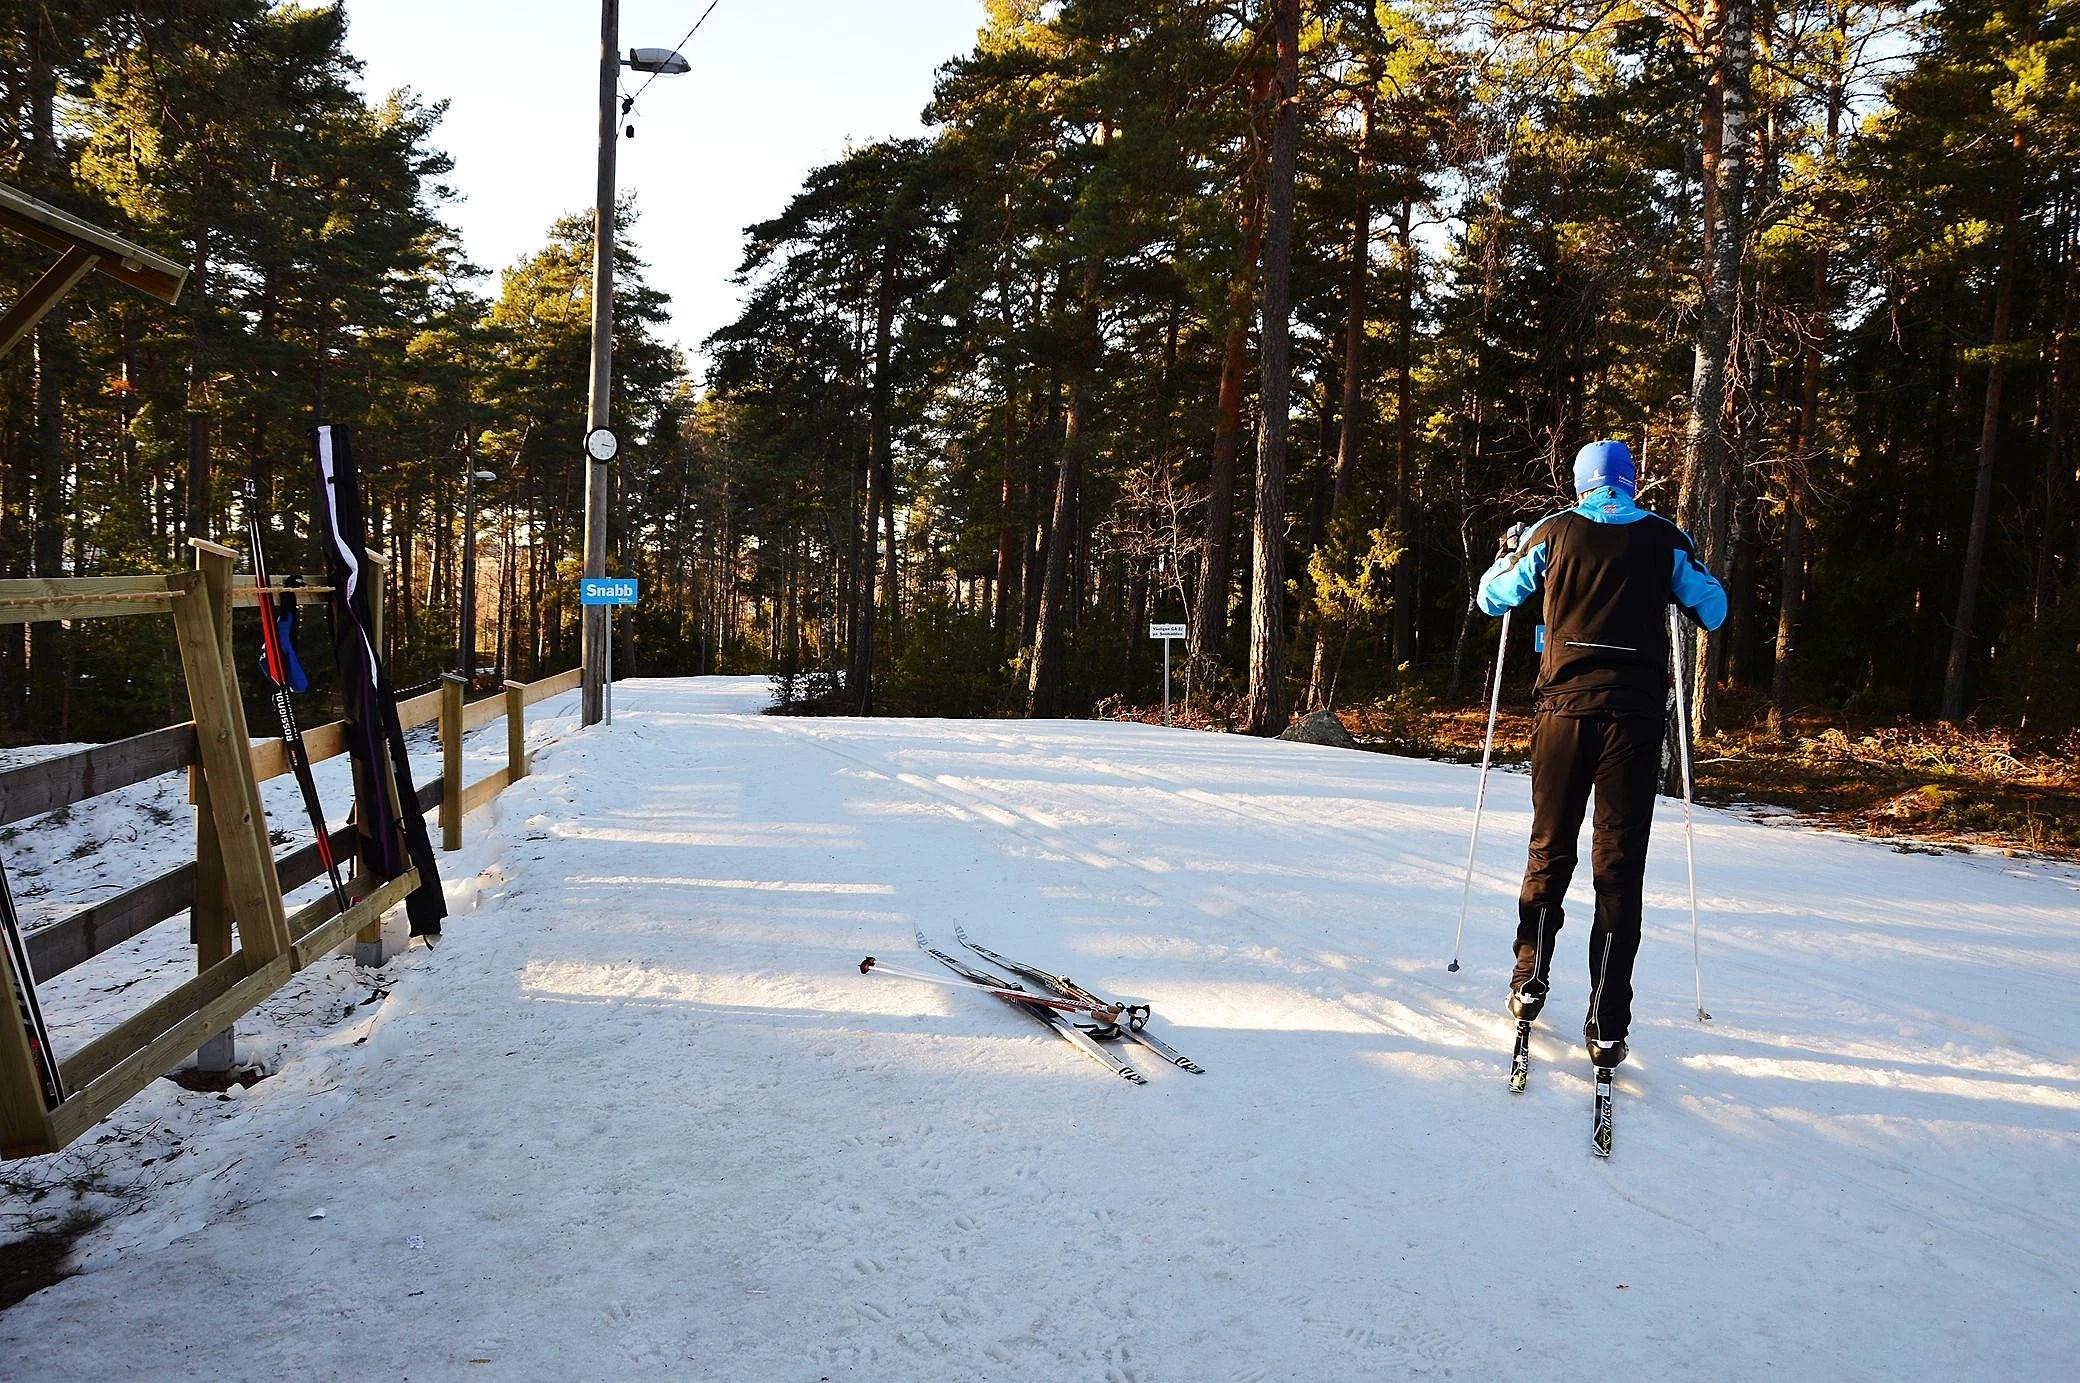 En plötslig skidabstinens